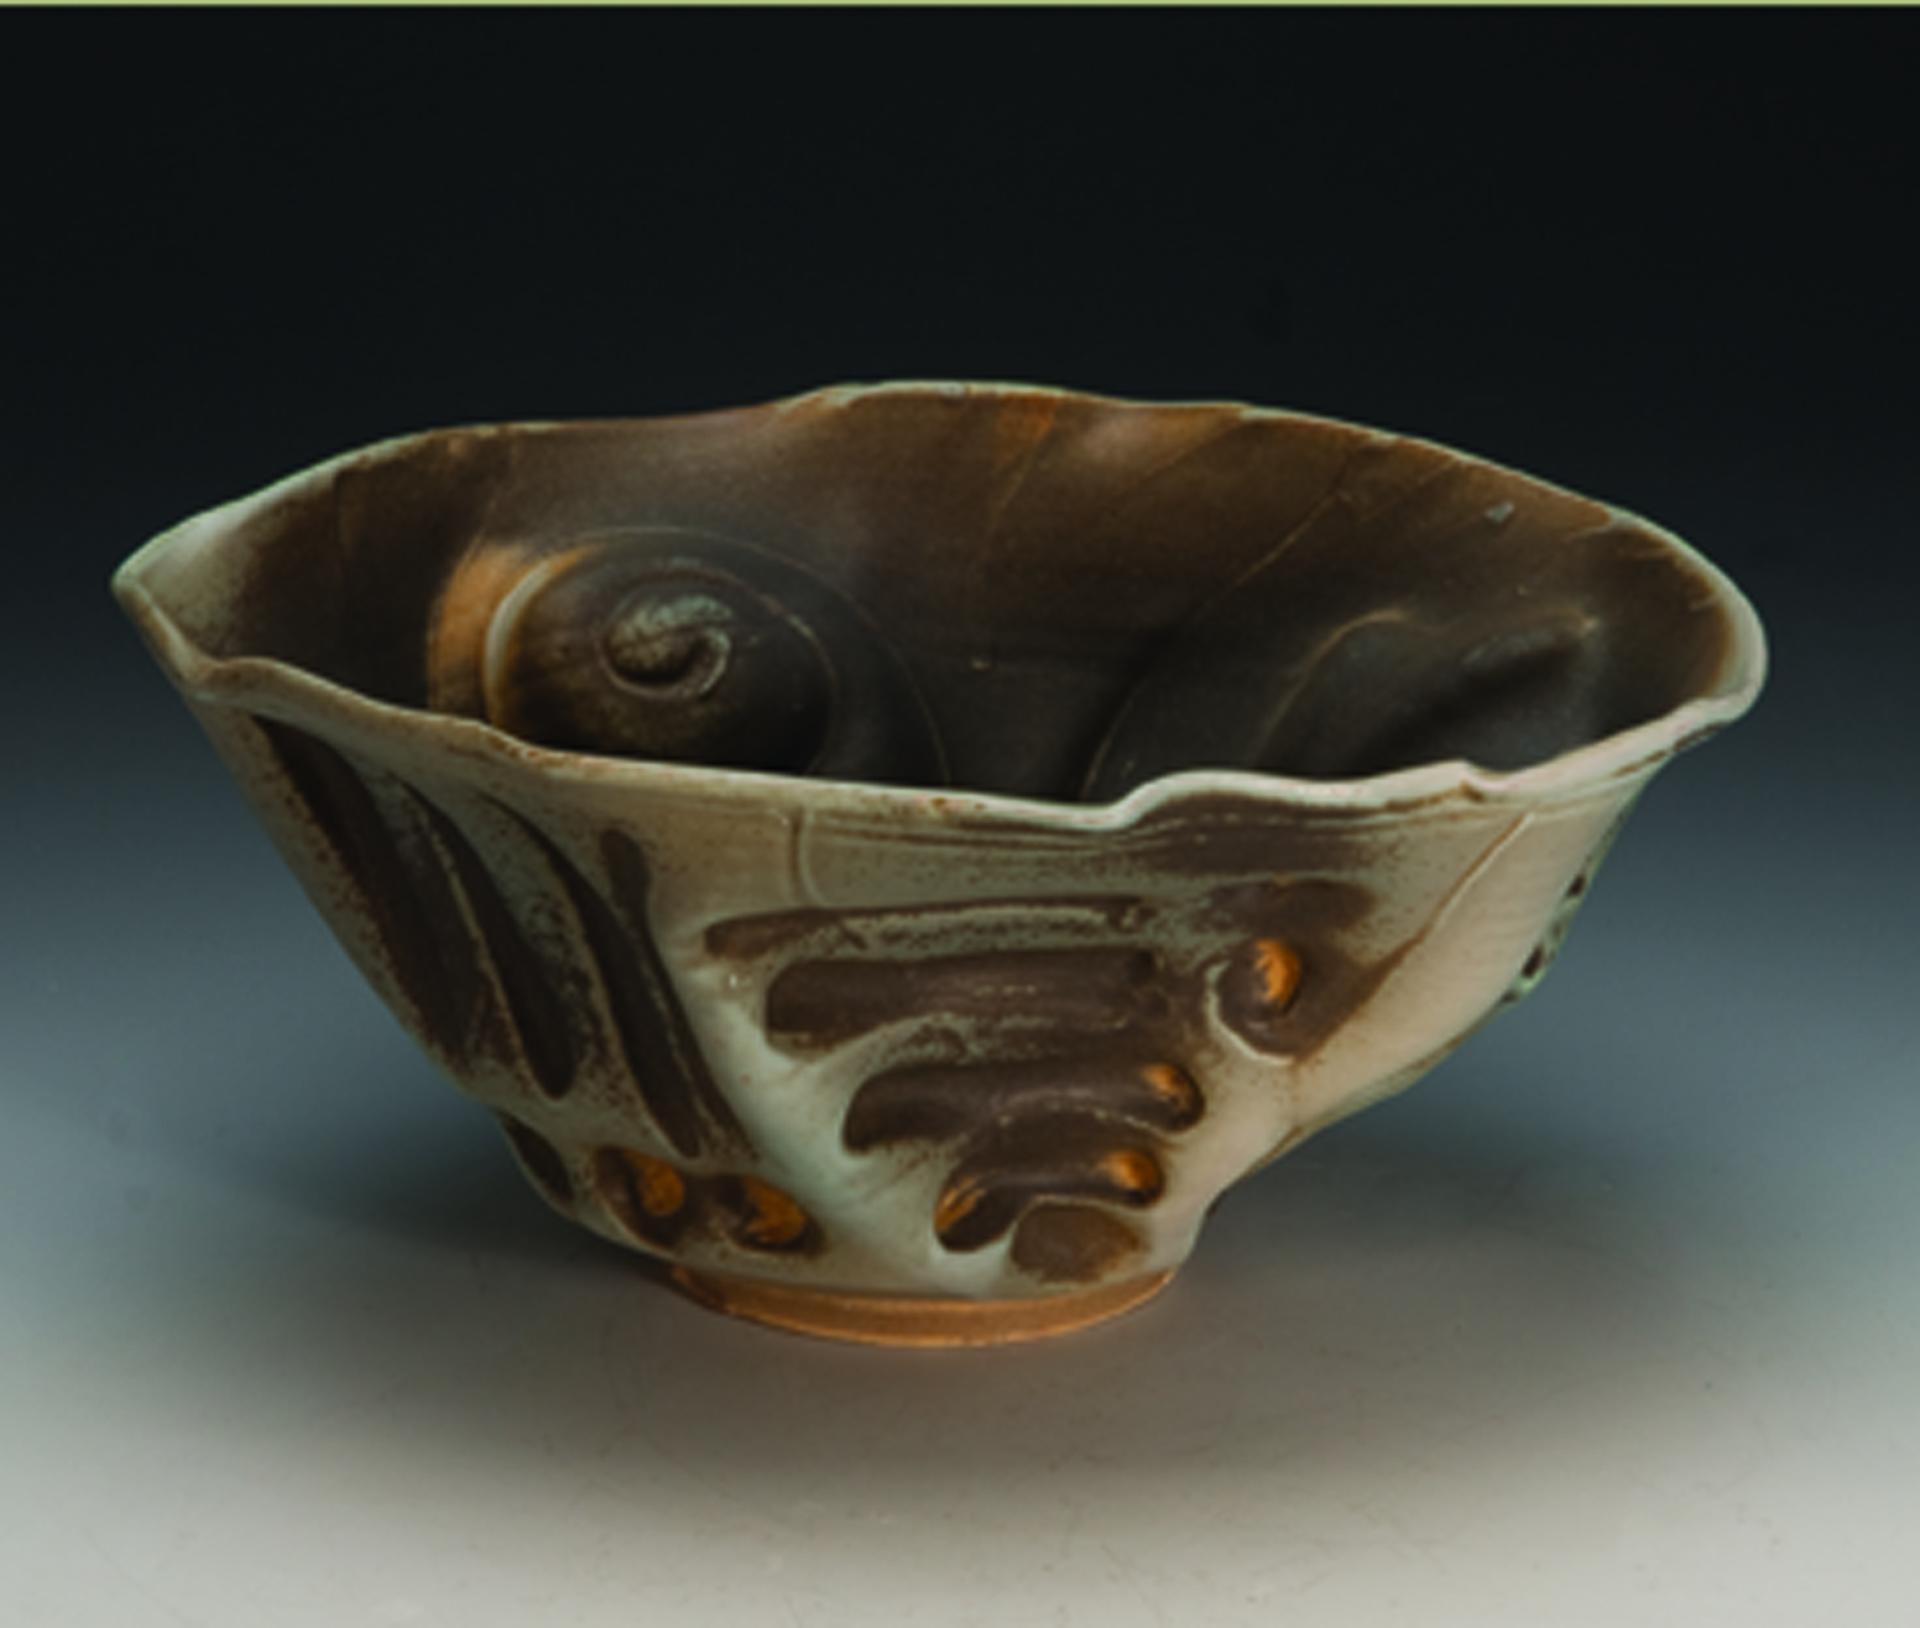 GSinger_'Undulation Series' bowl72DPI.jpg